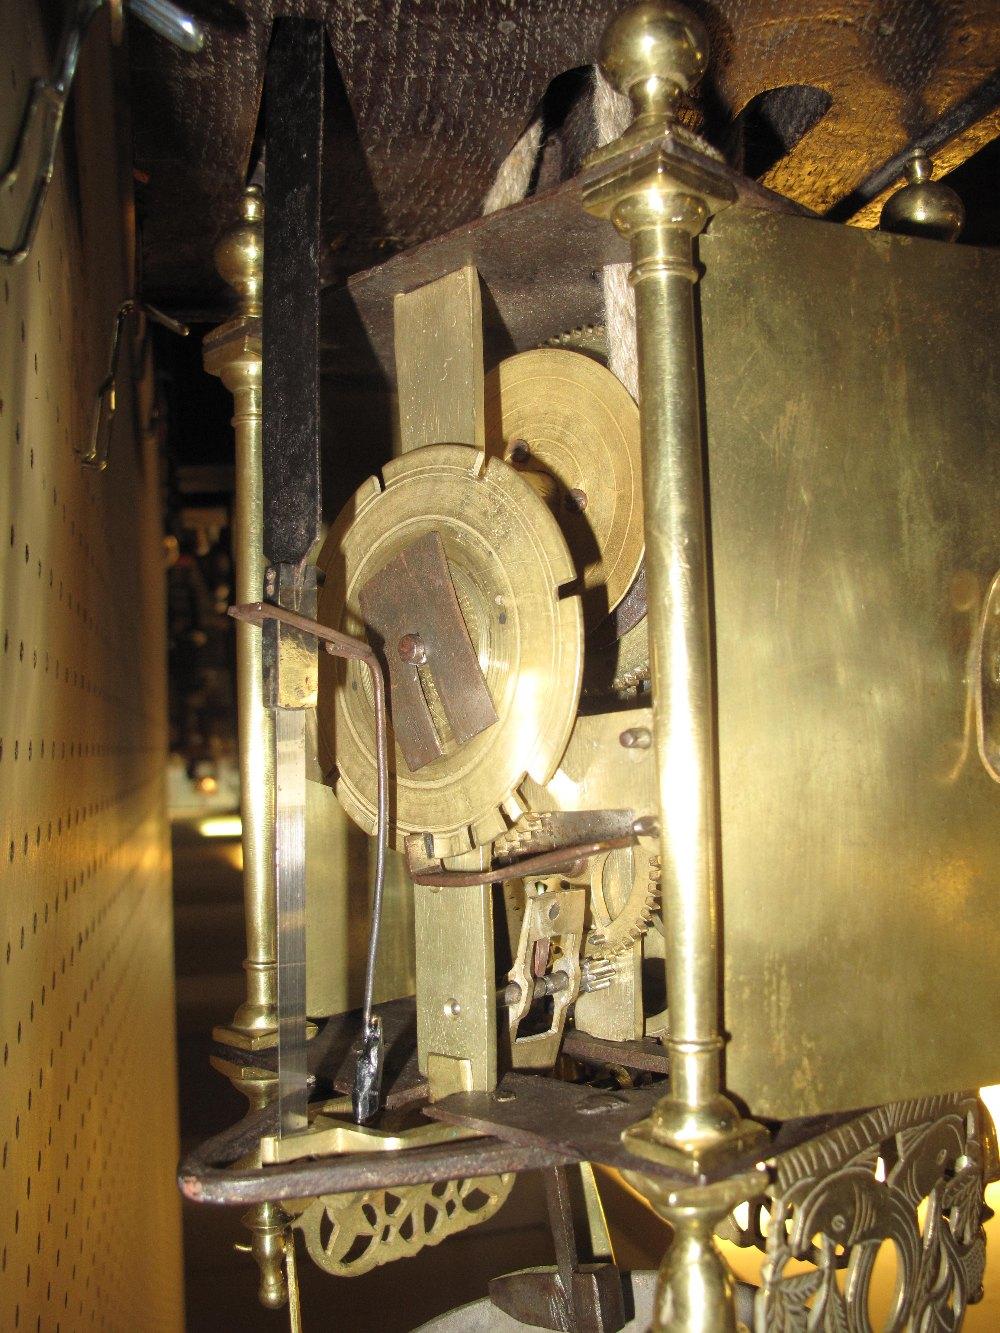 17TH CENTURY STYLE BRASS LANTERN CLOCK t - Image 3 of 5